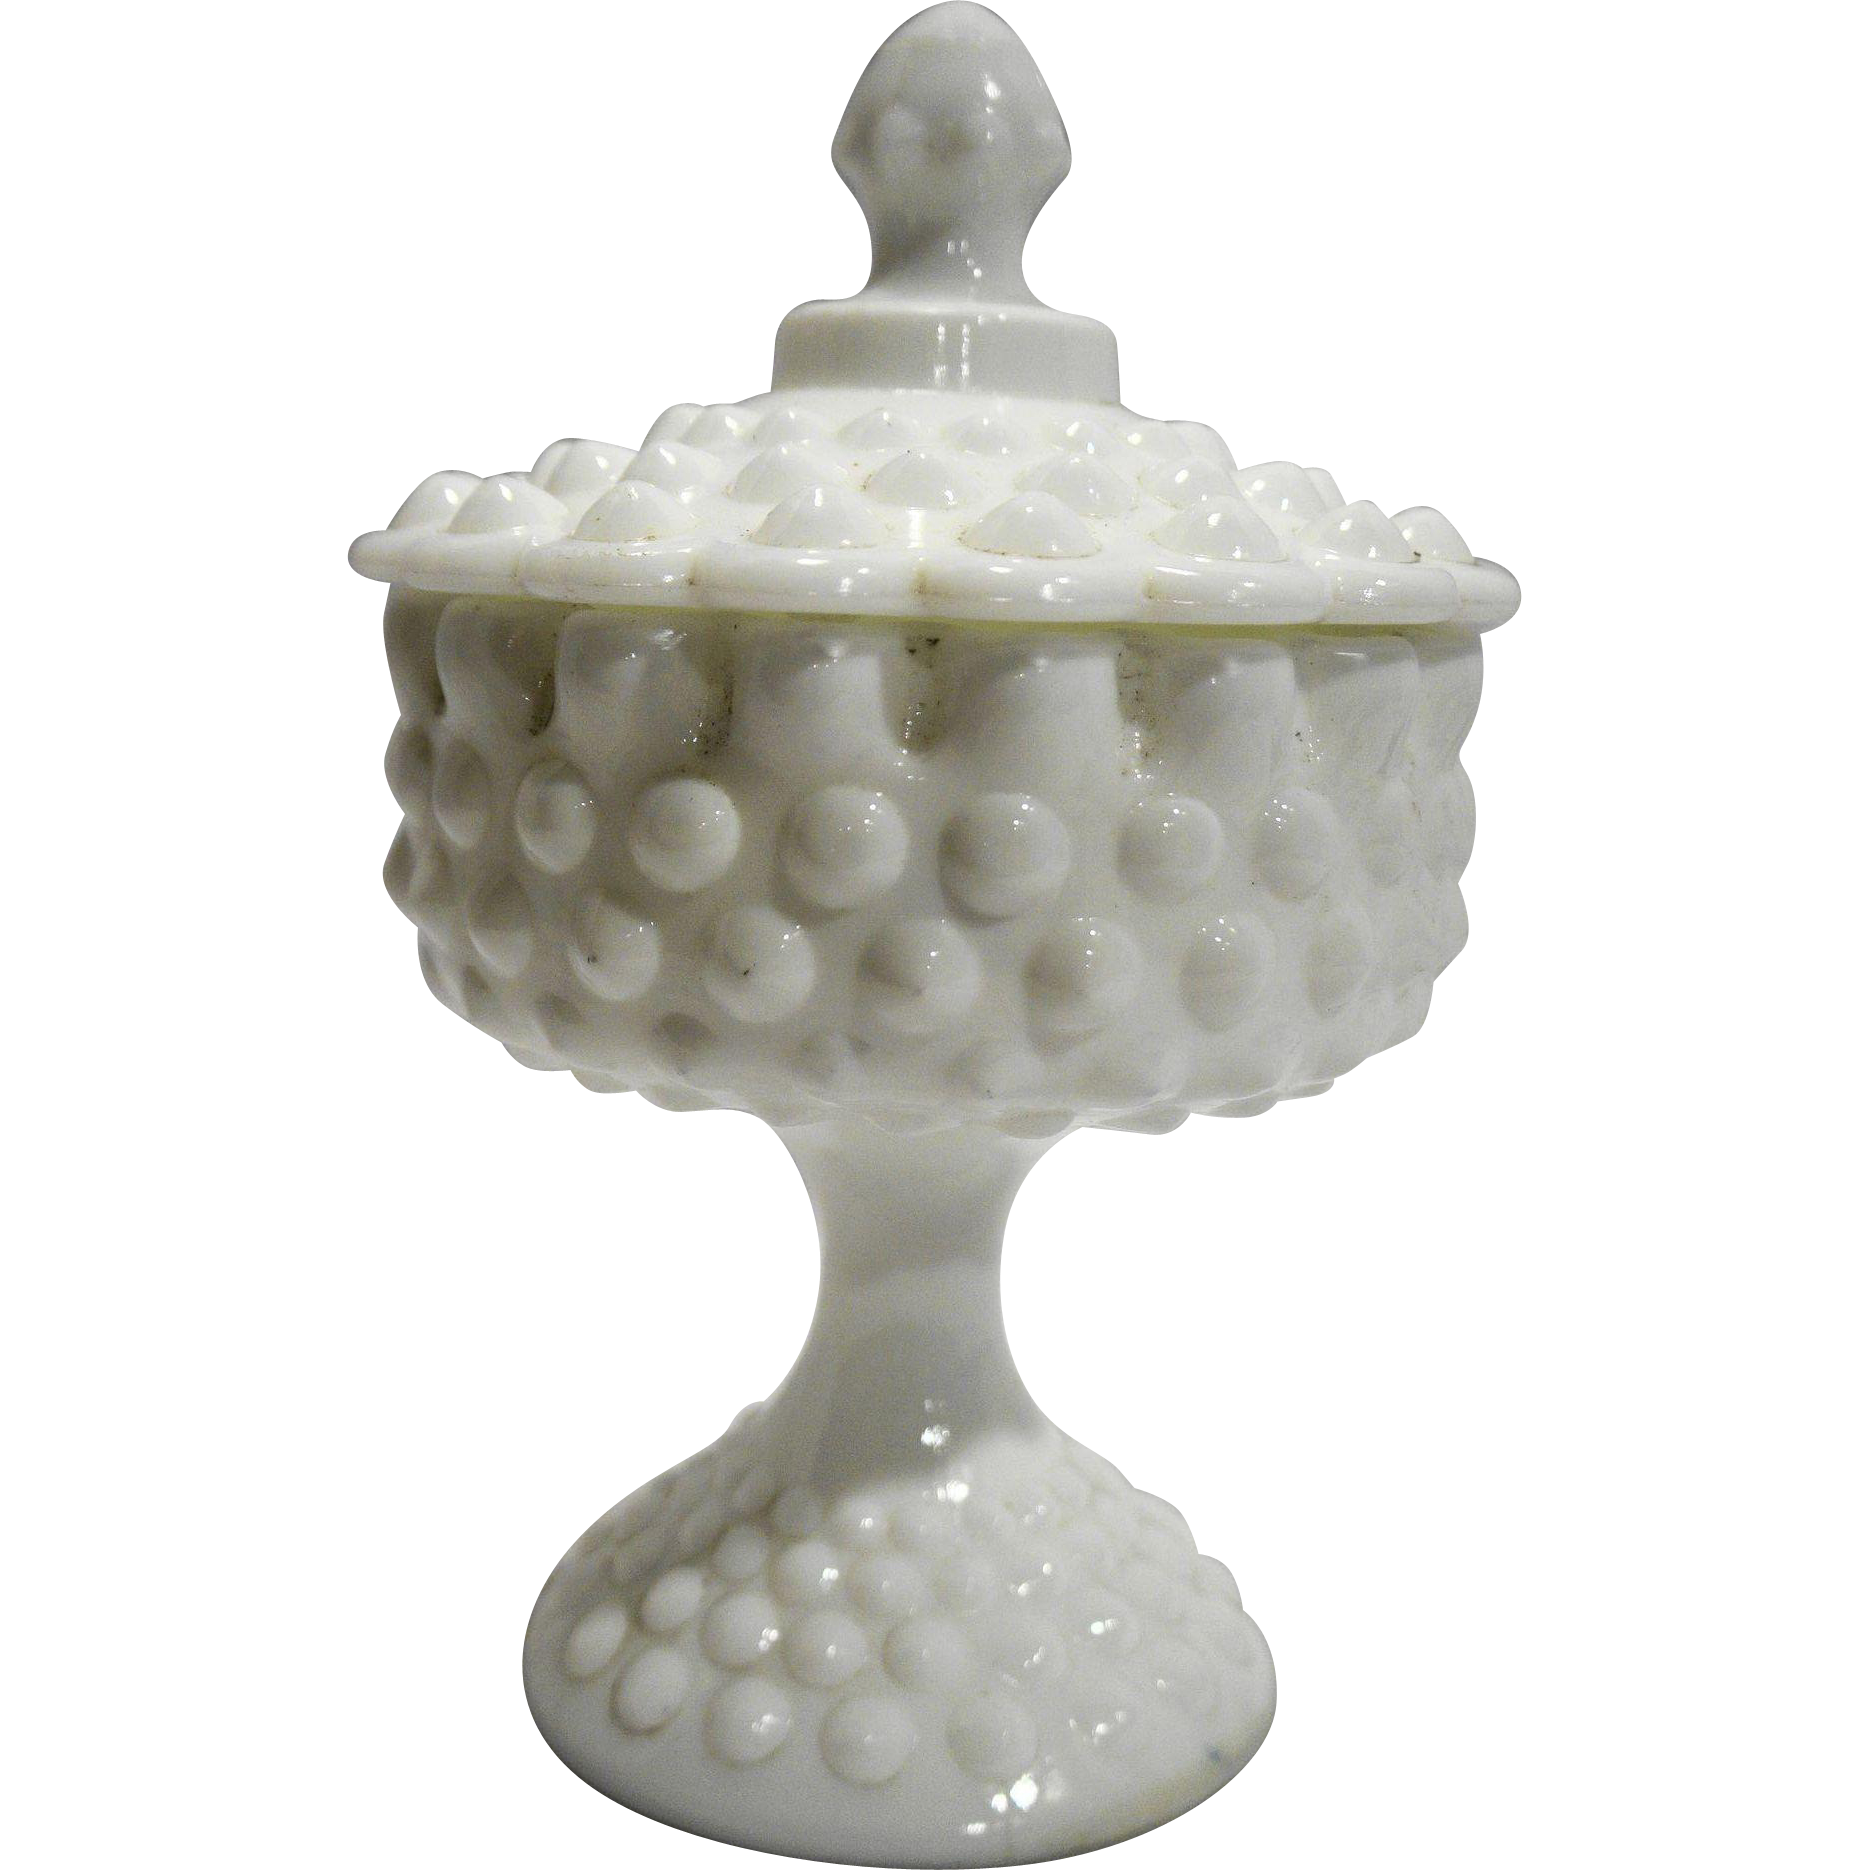 Fenton Hobnail White Milk Glass Candy Box Pedestal Footed 3885